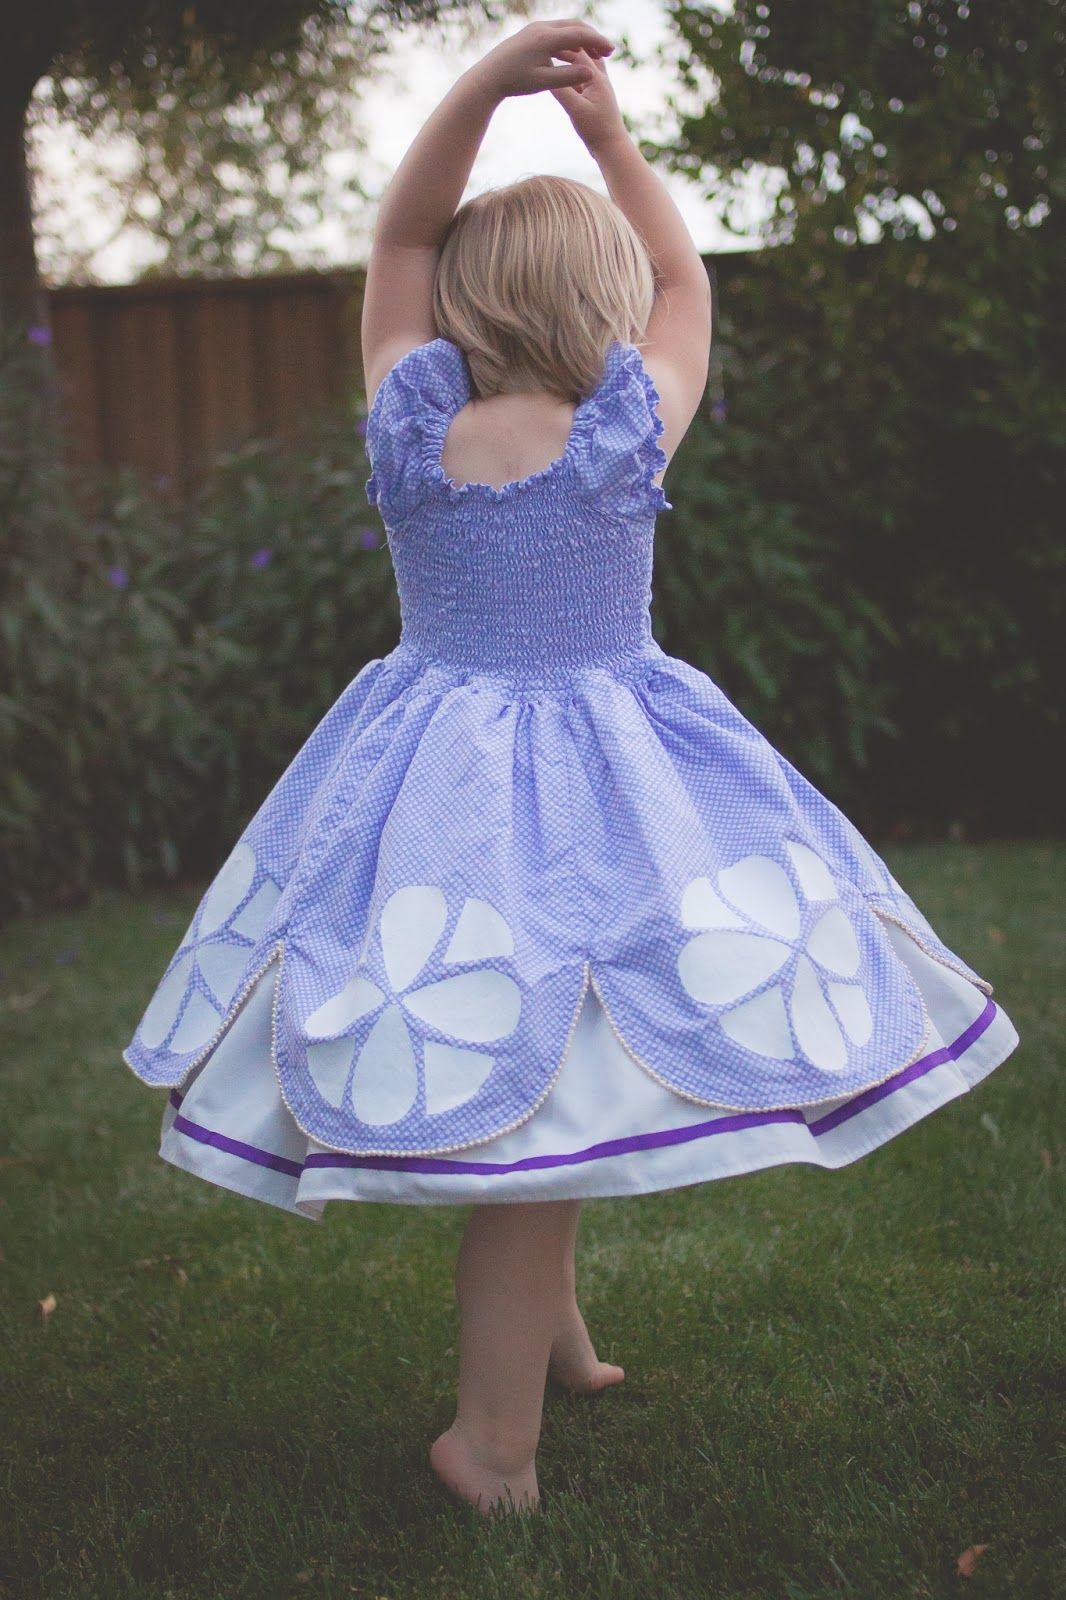 Creating Sofia the First with Foo Foo Threads. Easy Disney CostumesHalloween ... & Creating Sofia the First with Foo Foo Threads | Princess sofia dress ...